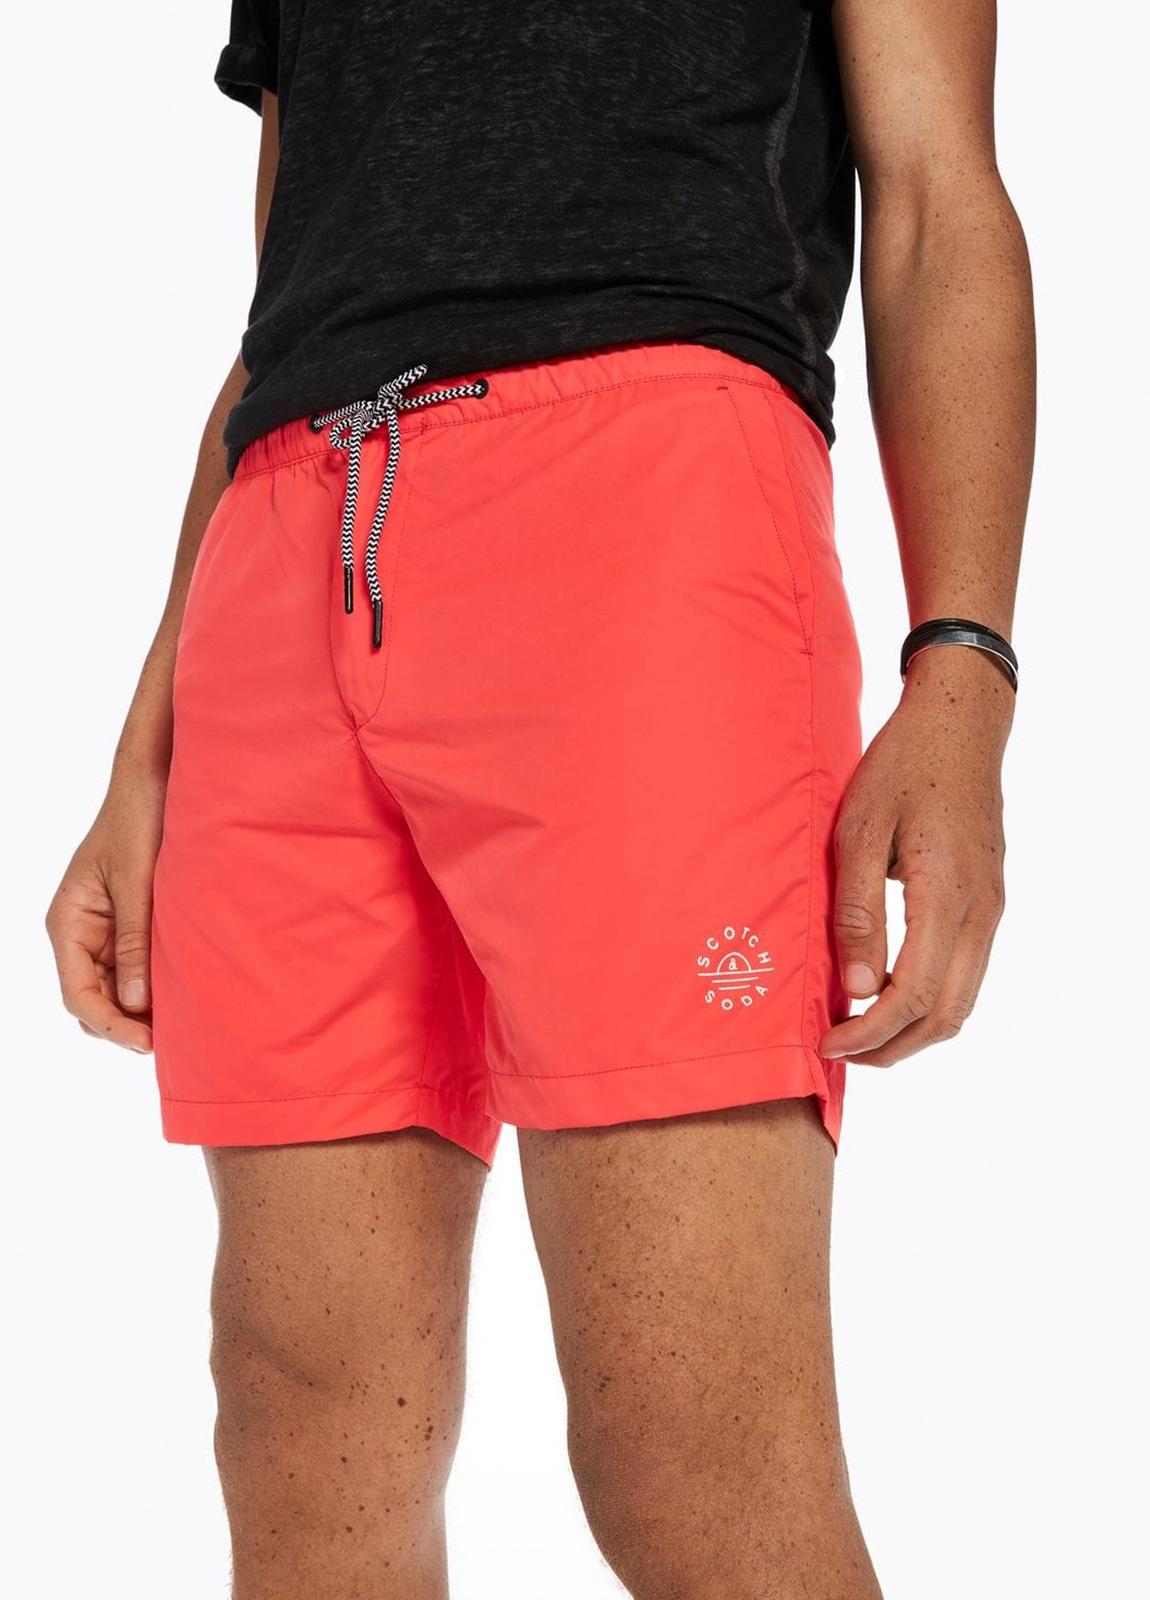 Bañador liso color coral con logo impreso. 100% Poliéster. - Ítem2